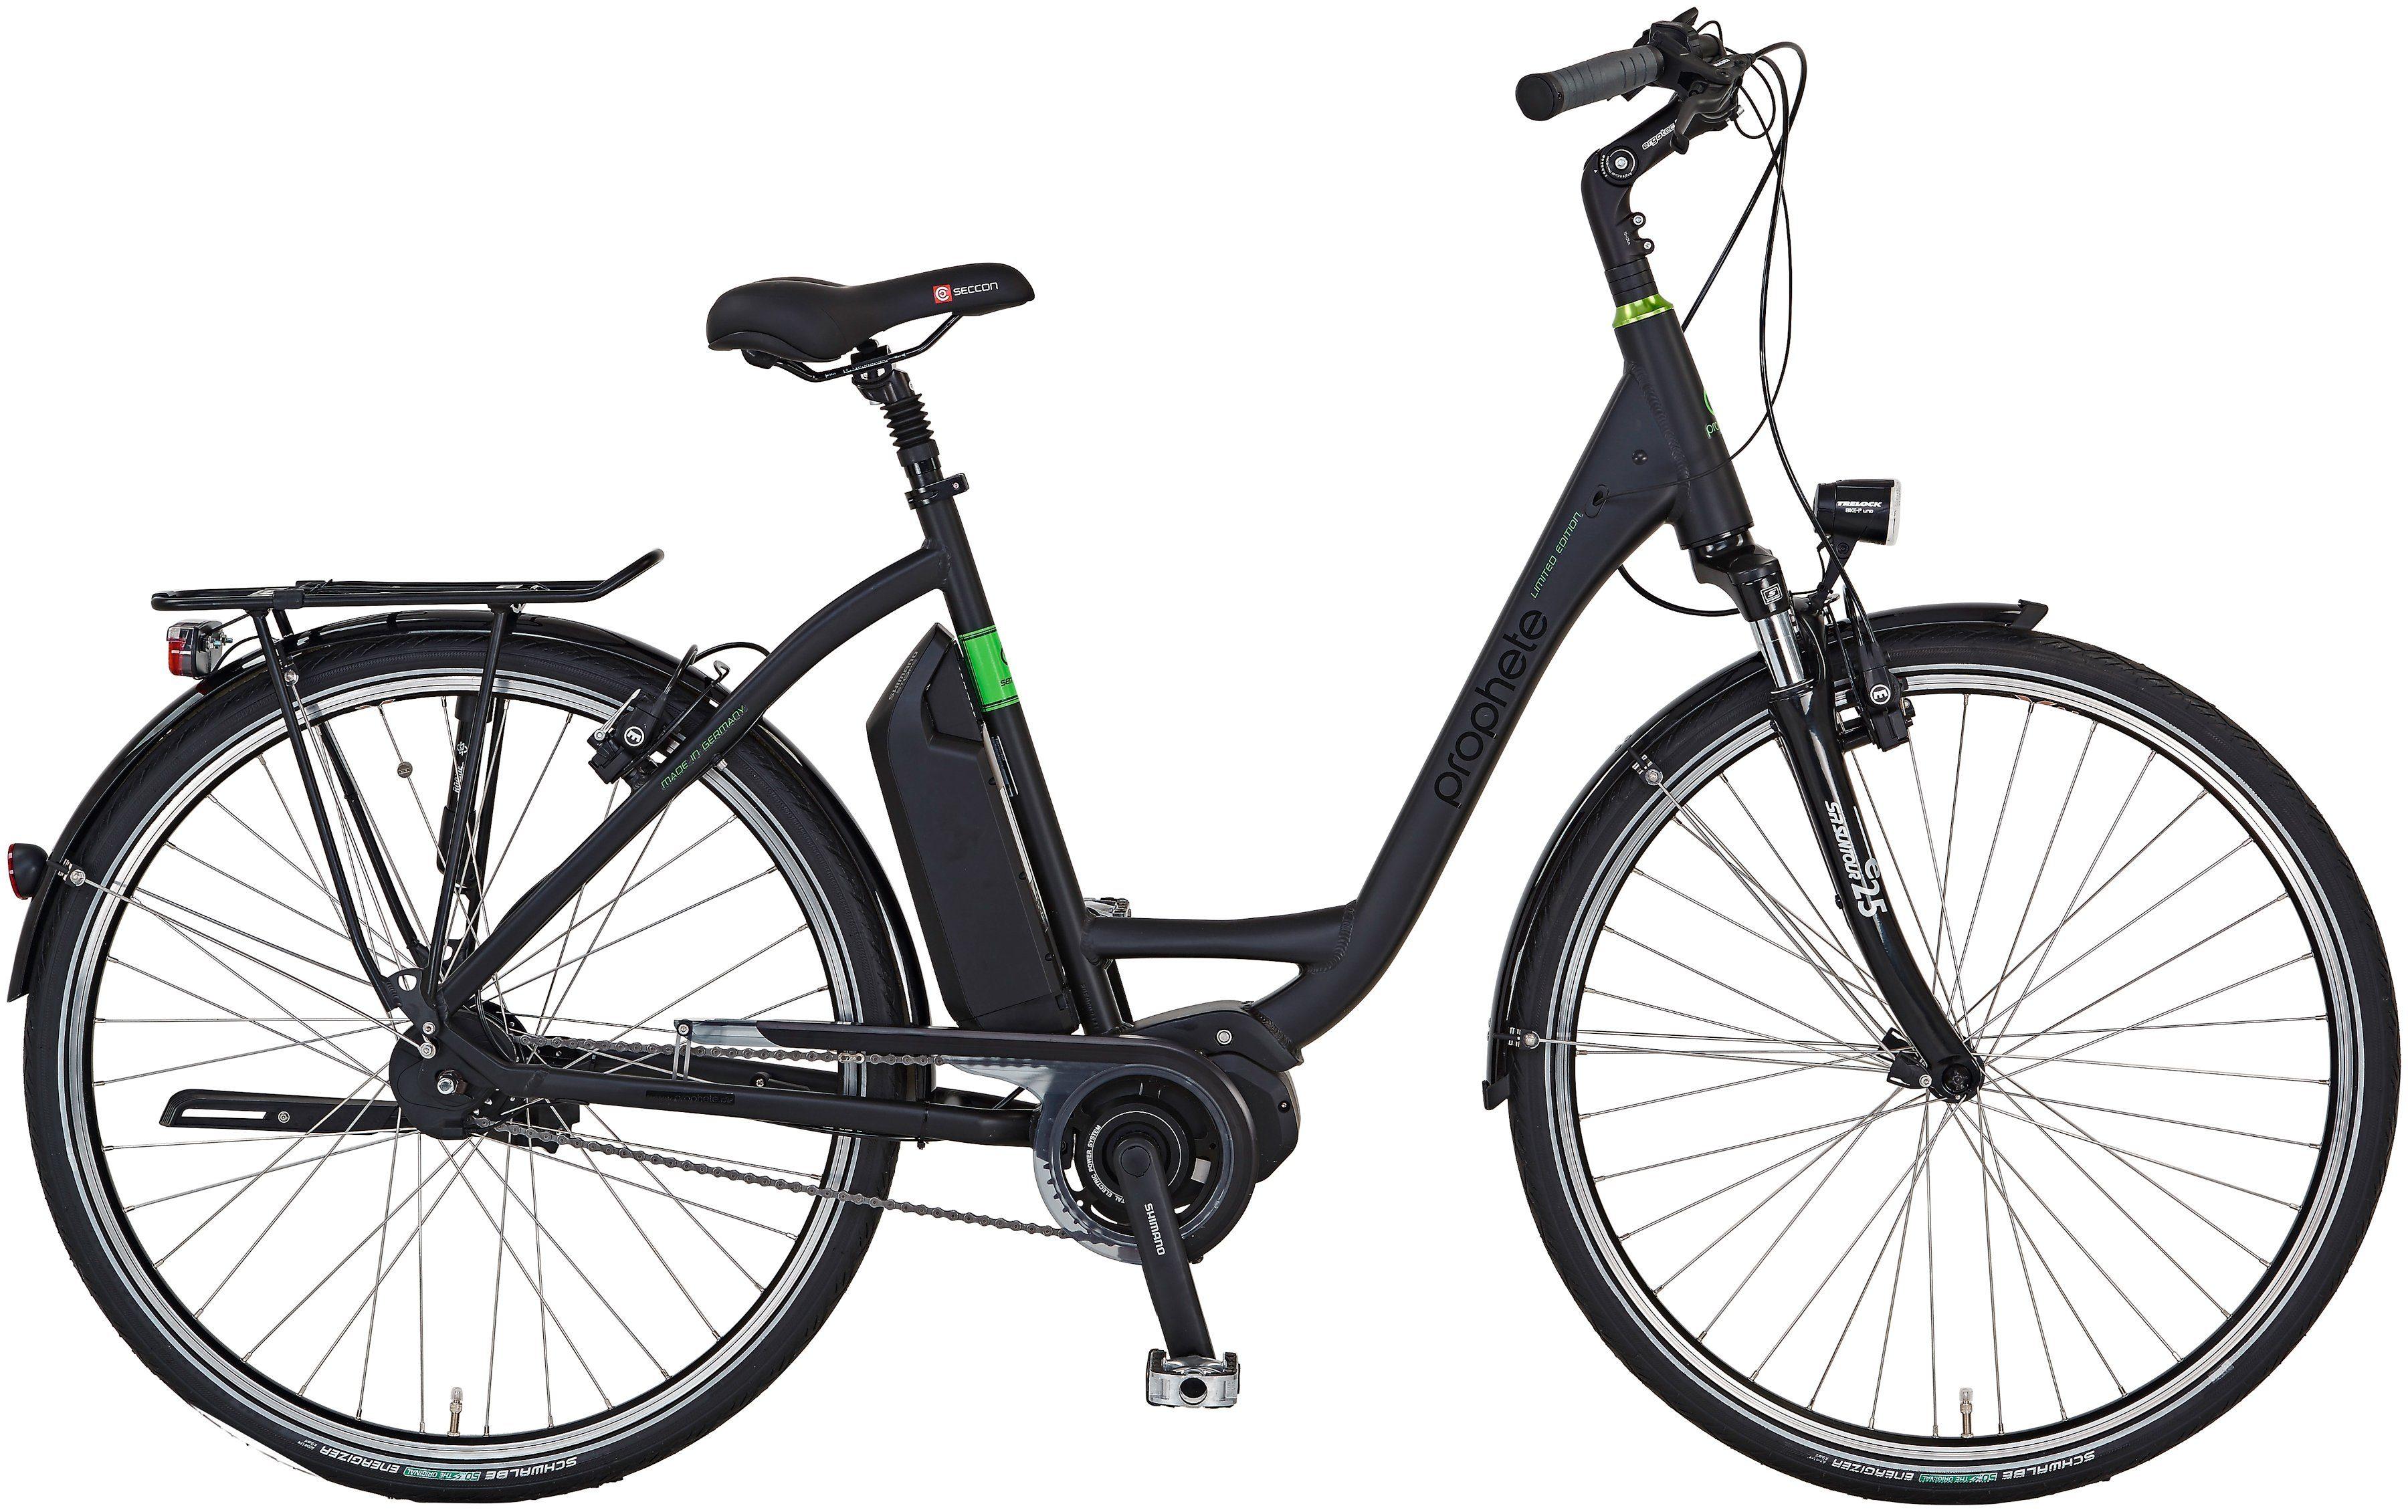 Prophete E-Bike City Damen »Limited Edition«, 28 Zoll, 8-Gang, Mittelmotor, 417 Wh, RH50